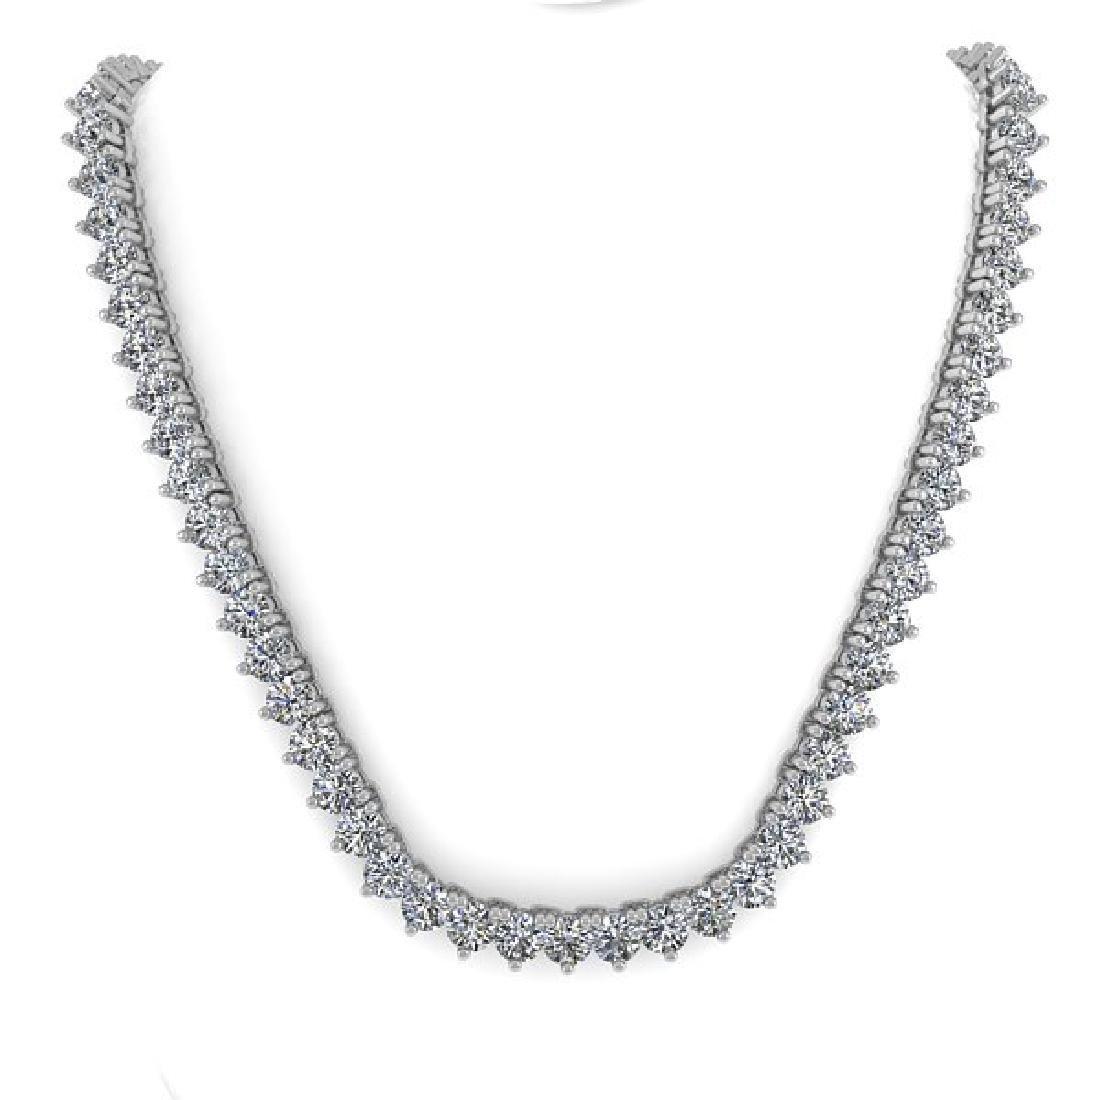 38 CTW Solitaire SI Diamond Necklace 14K White Gold - 3